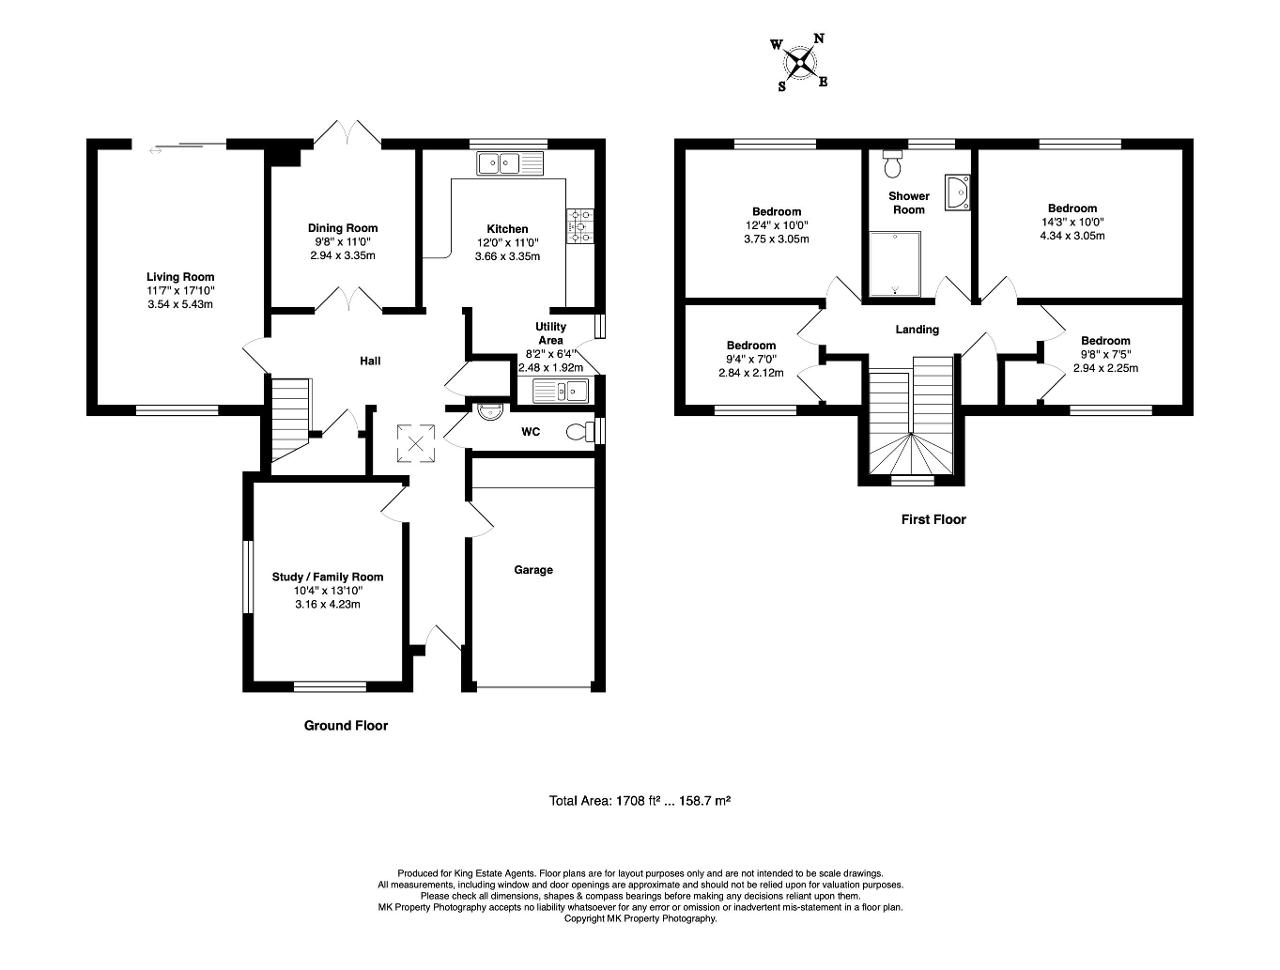 Floorplan for Blackmoor Gate, Furzton, Milton Keynes, Buckinghamshire, MK4 1DN